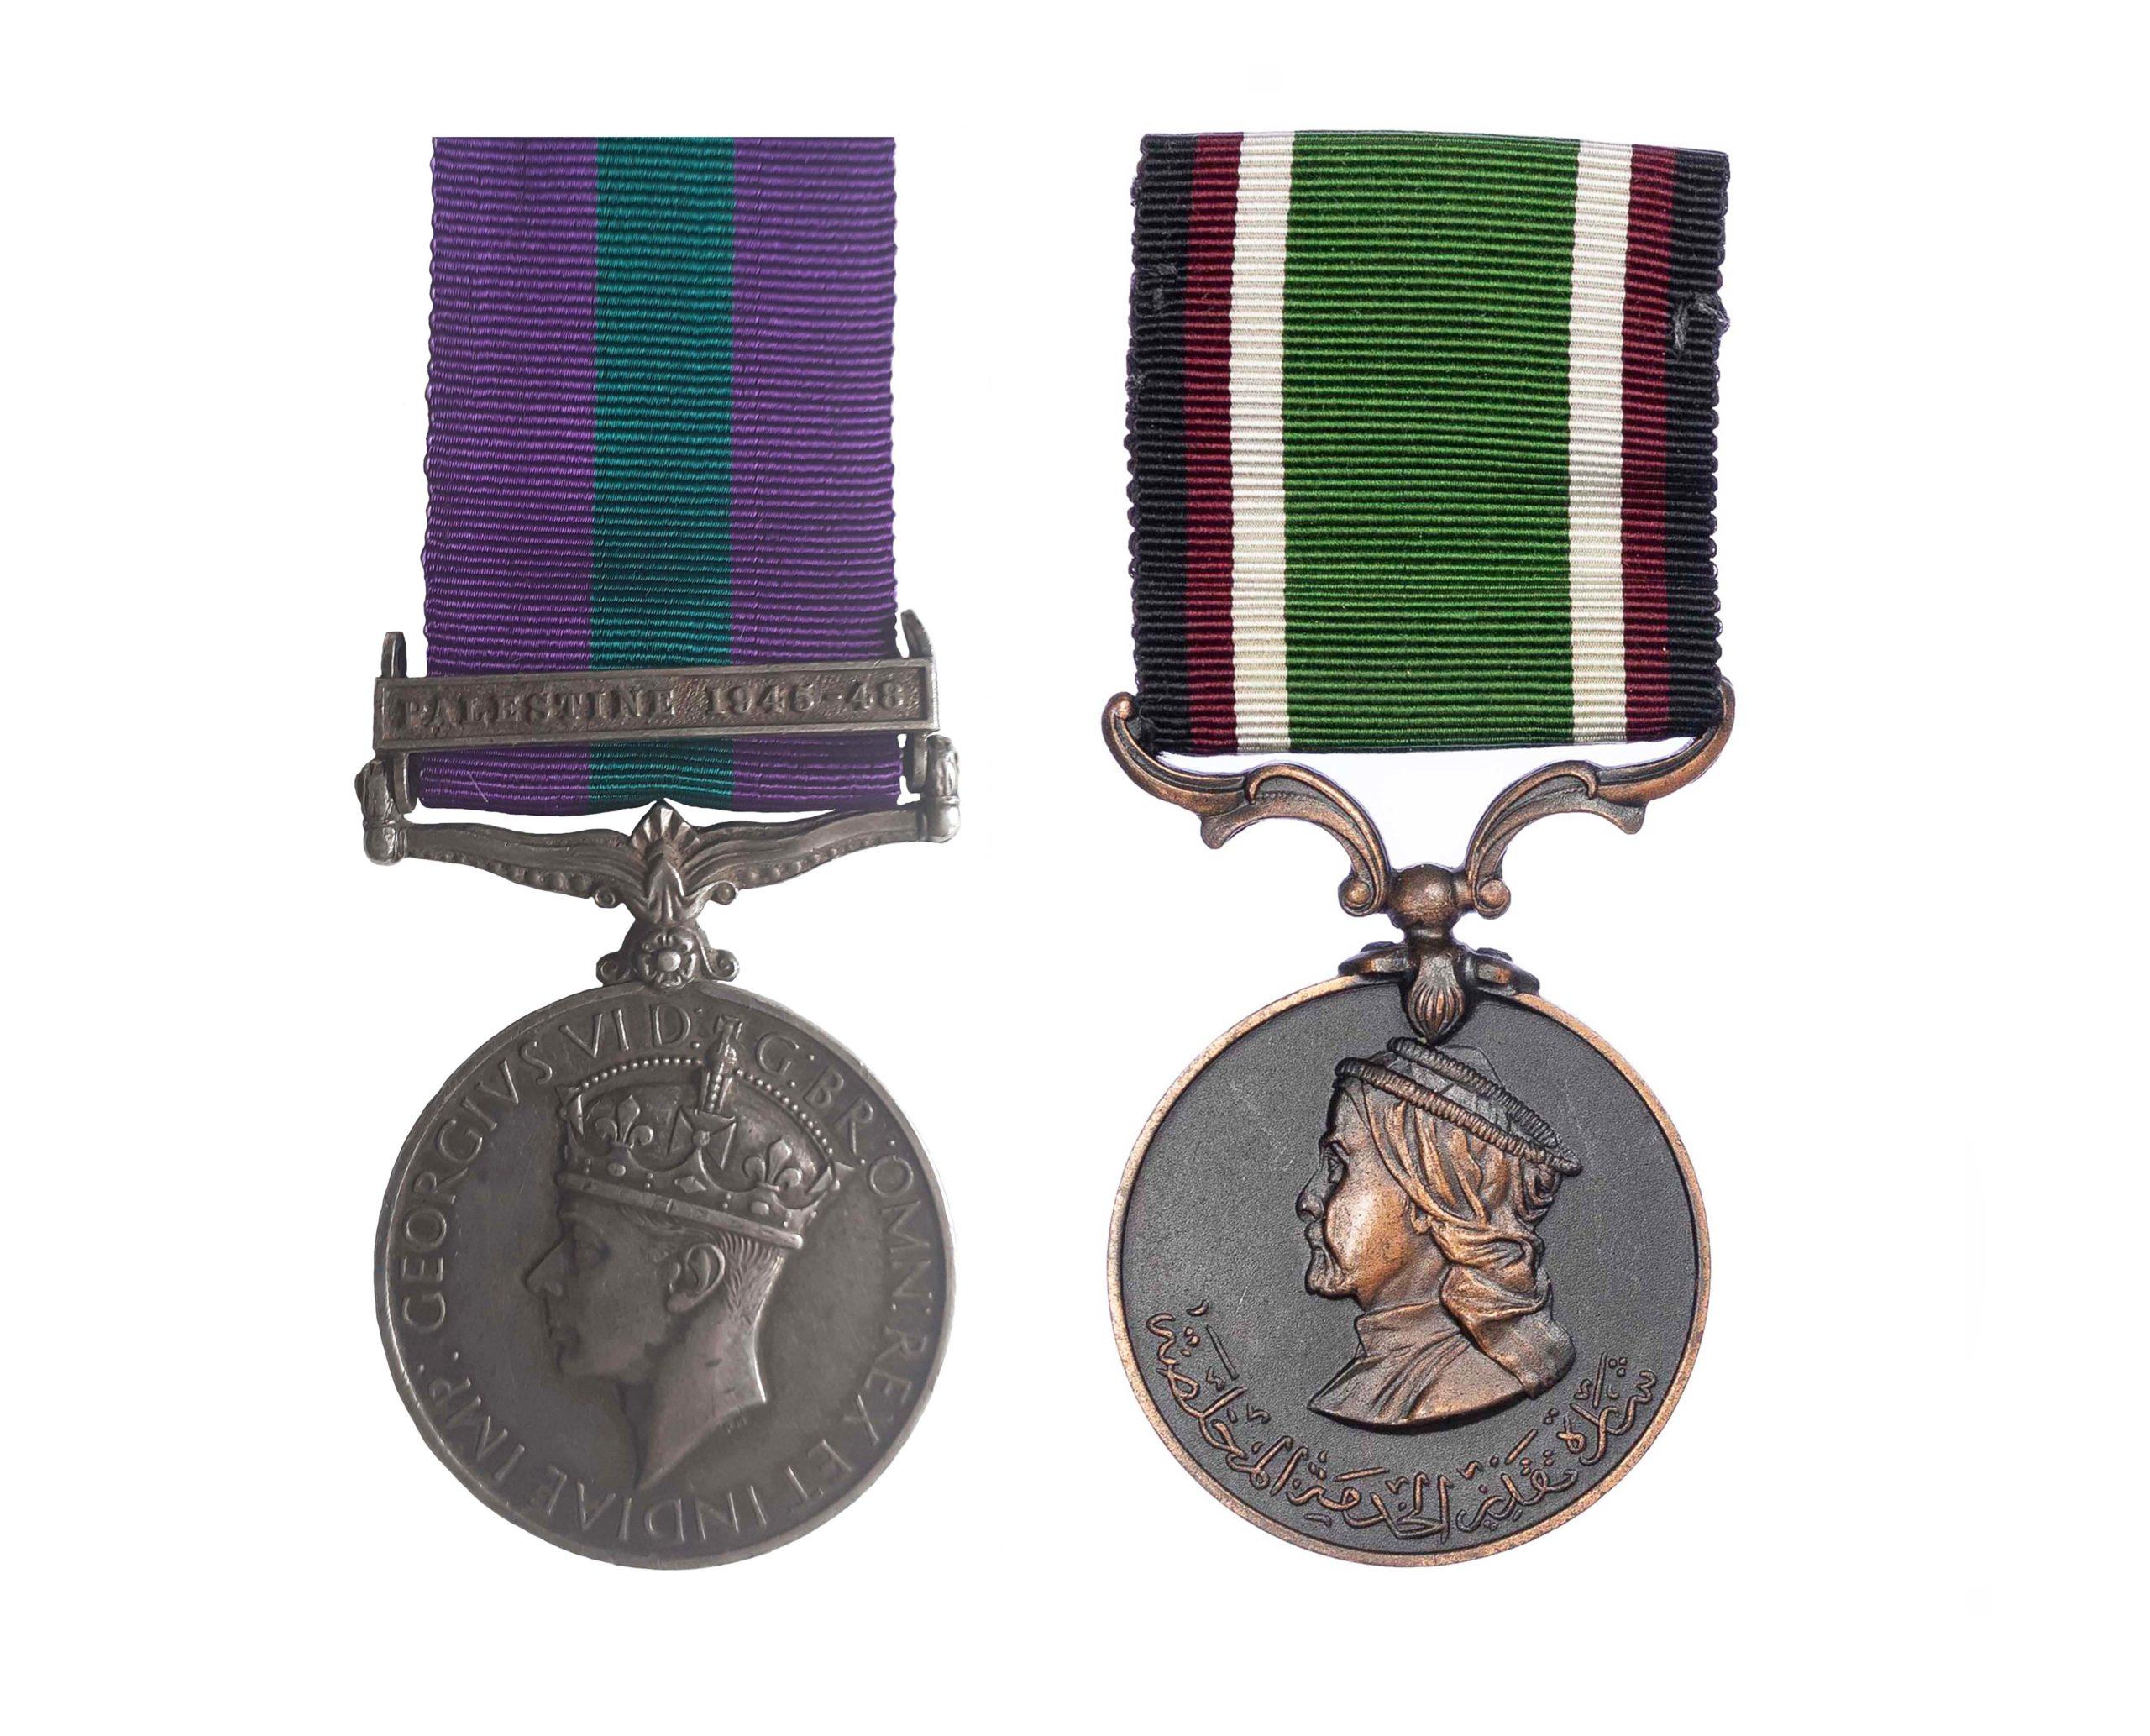 General Service Medal 1918-62, GVIR, one clasp Palestine 1945-48 Trans Jordan Long and Faithful Service Medal pair to Private Mustafa Muhd Mahmoud